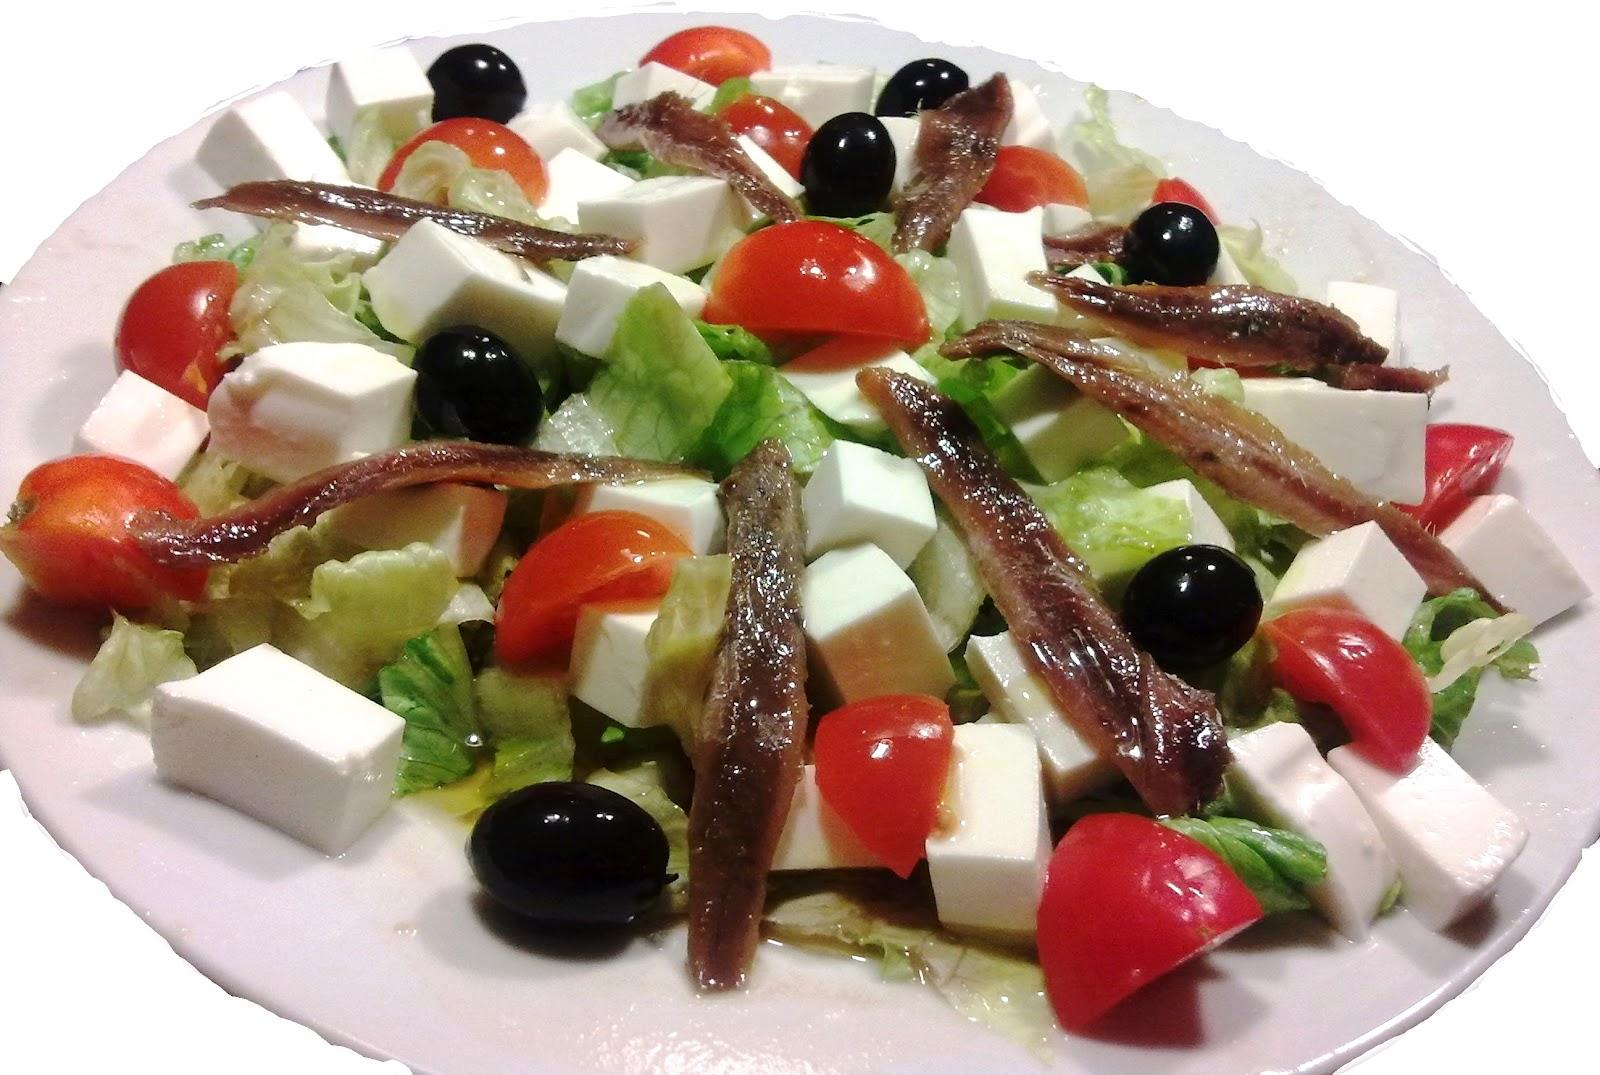 Ensalada de patata y anchoas con queso fresco